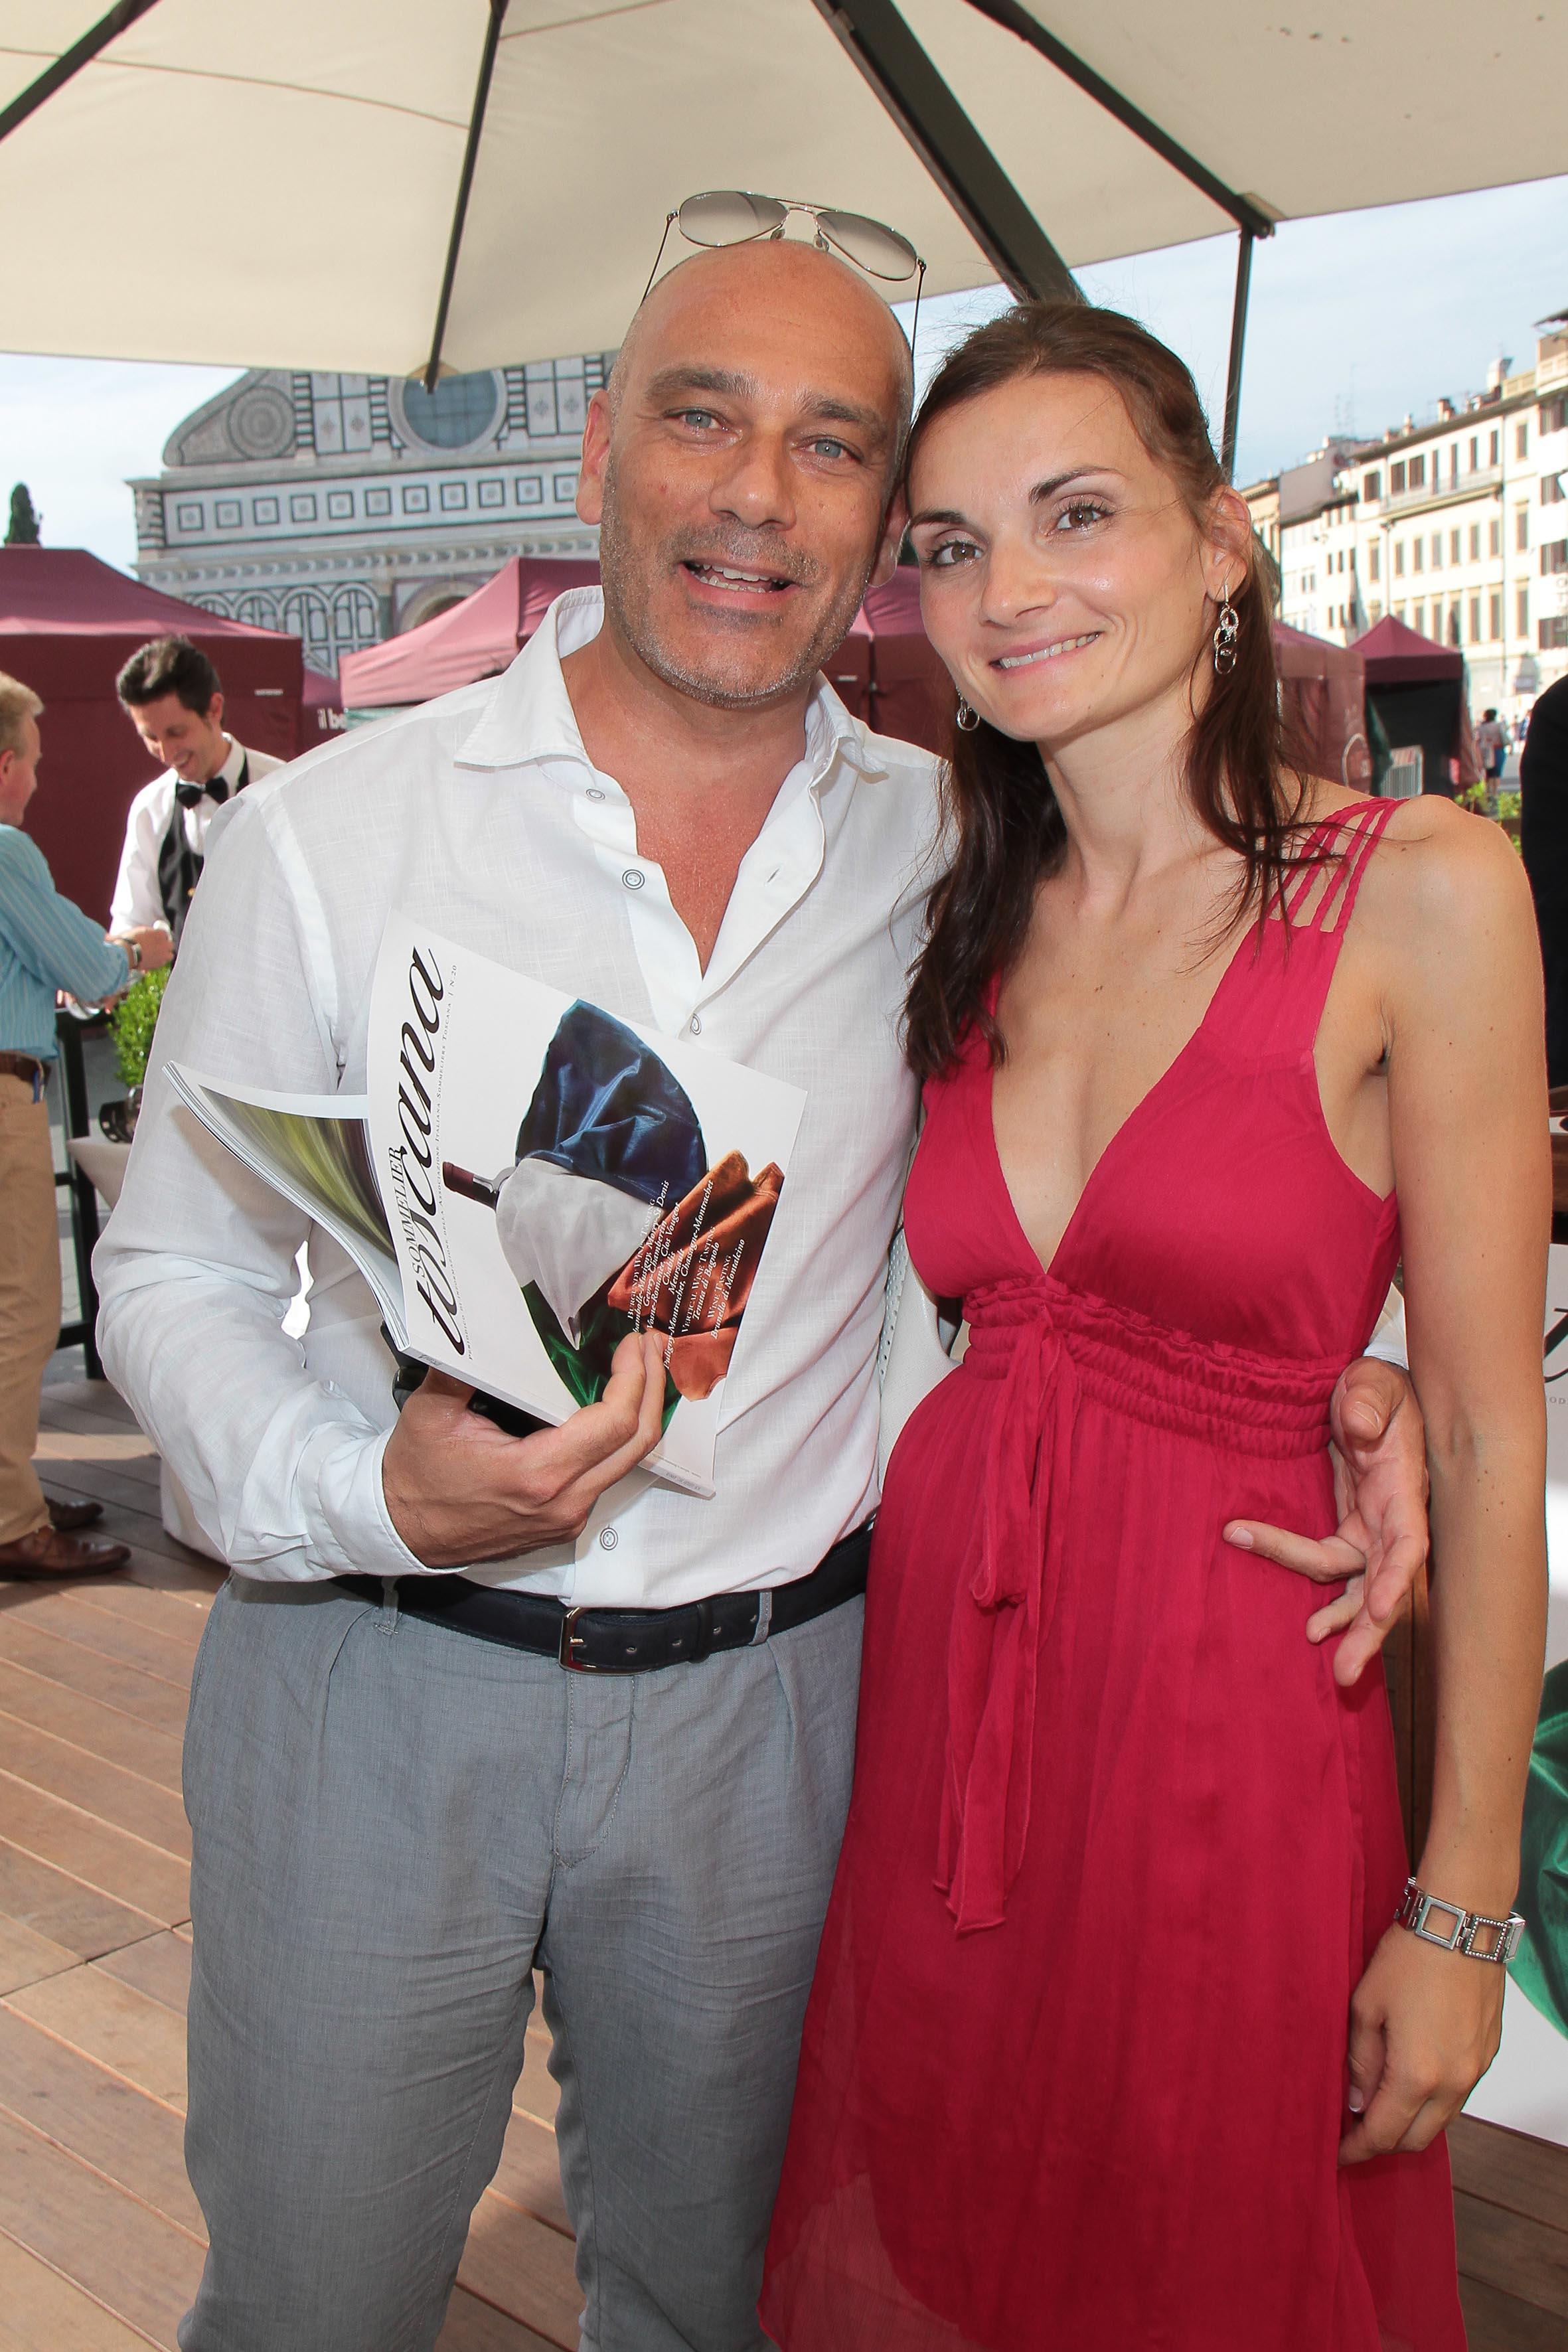 PRESSPHOTO Firenze, JK Place, Toscana Sommelier. Nella foto Karin Matscher e Gianni Tartarini giuseppe cabras/new press photo